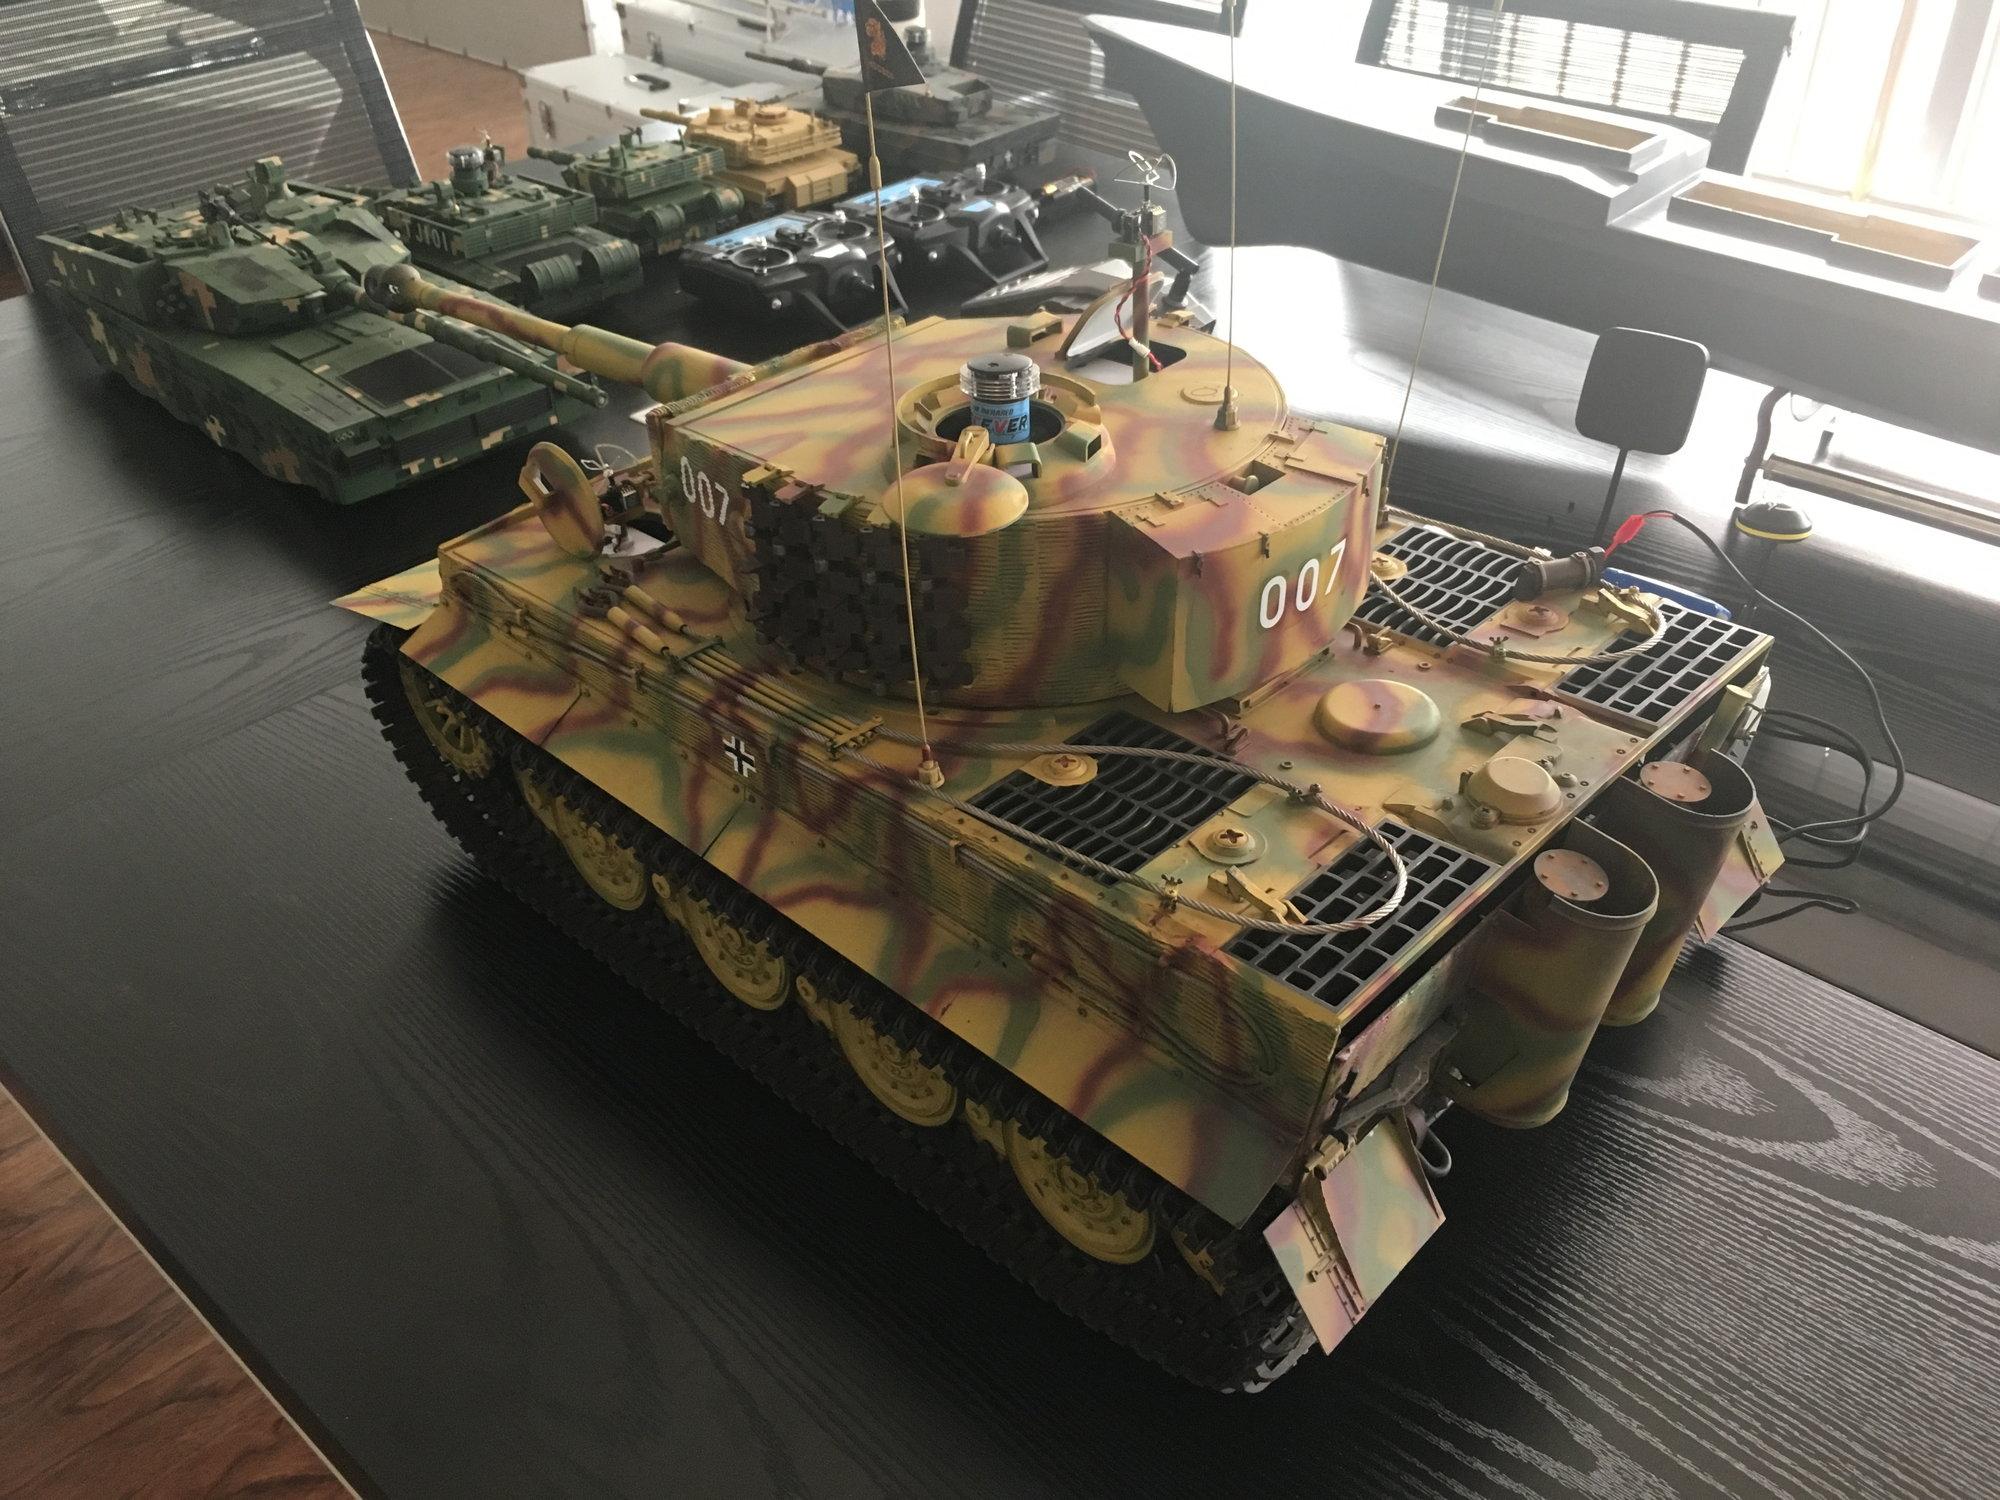 Hooben 1/16 rc tank M26,elephant,tiger.photo update - RC Groups